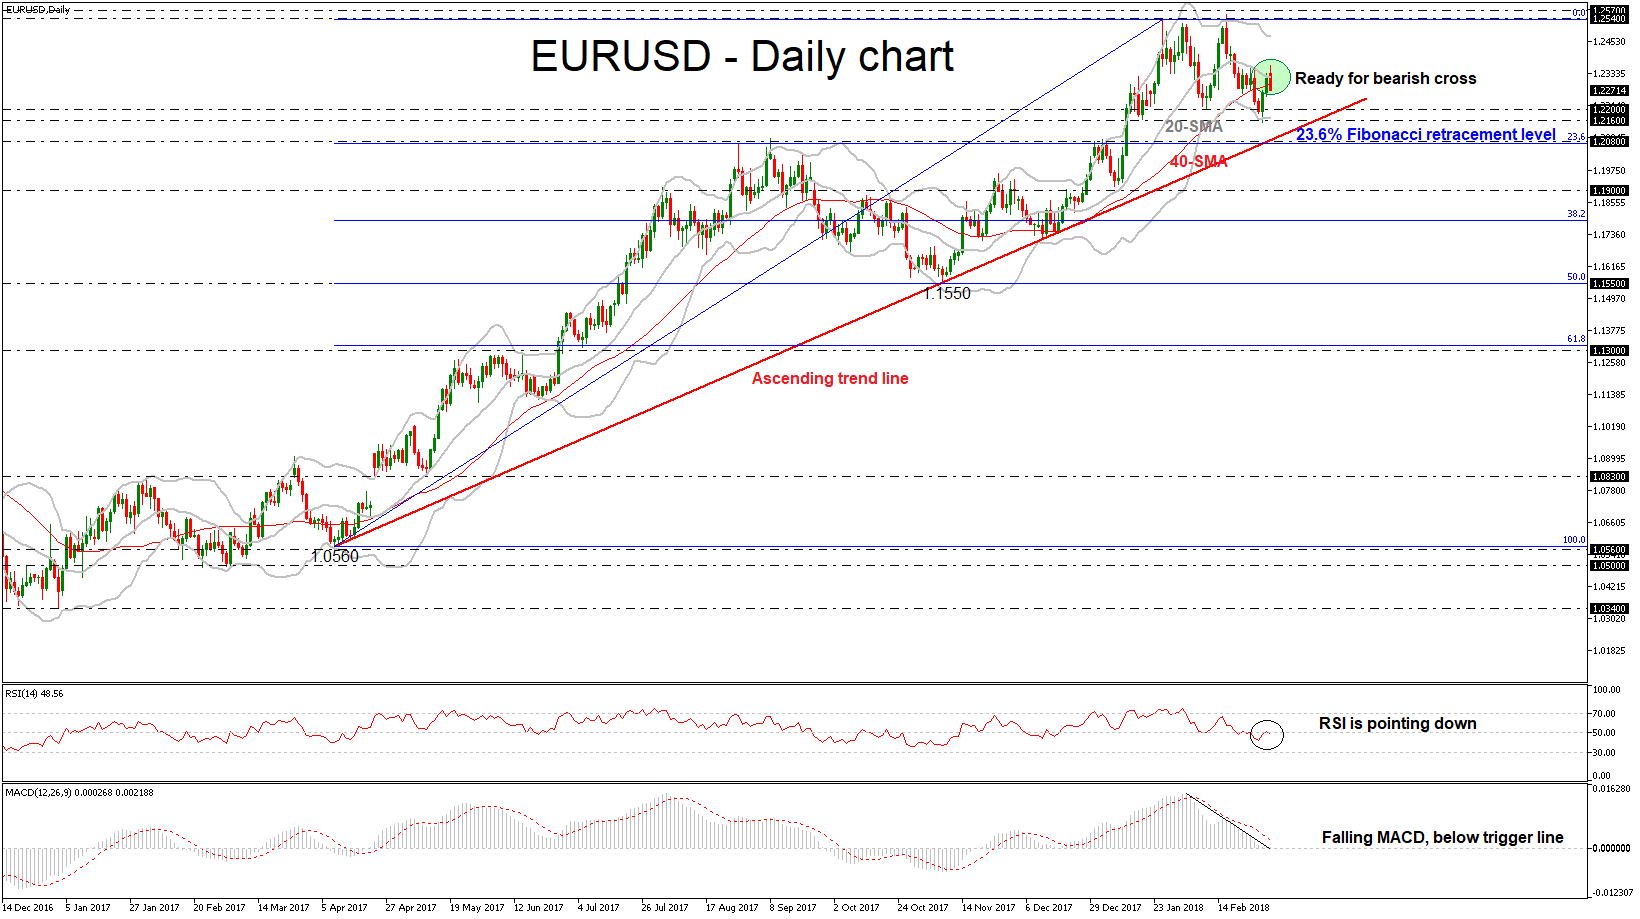 EUR/USD 05 MAR 2018 | EconAlerts